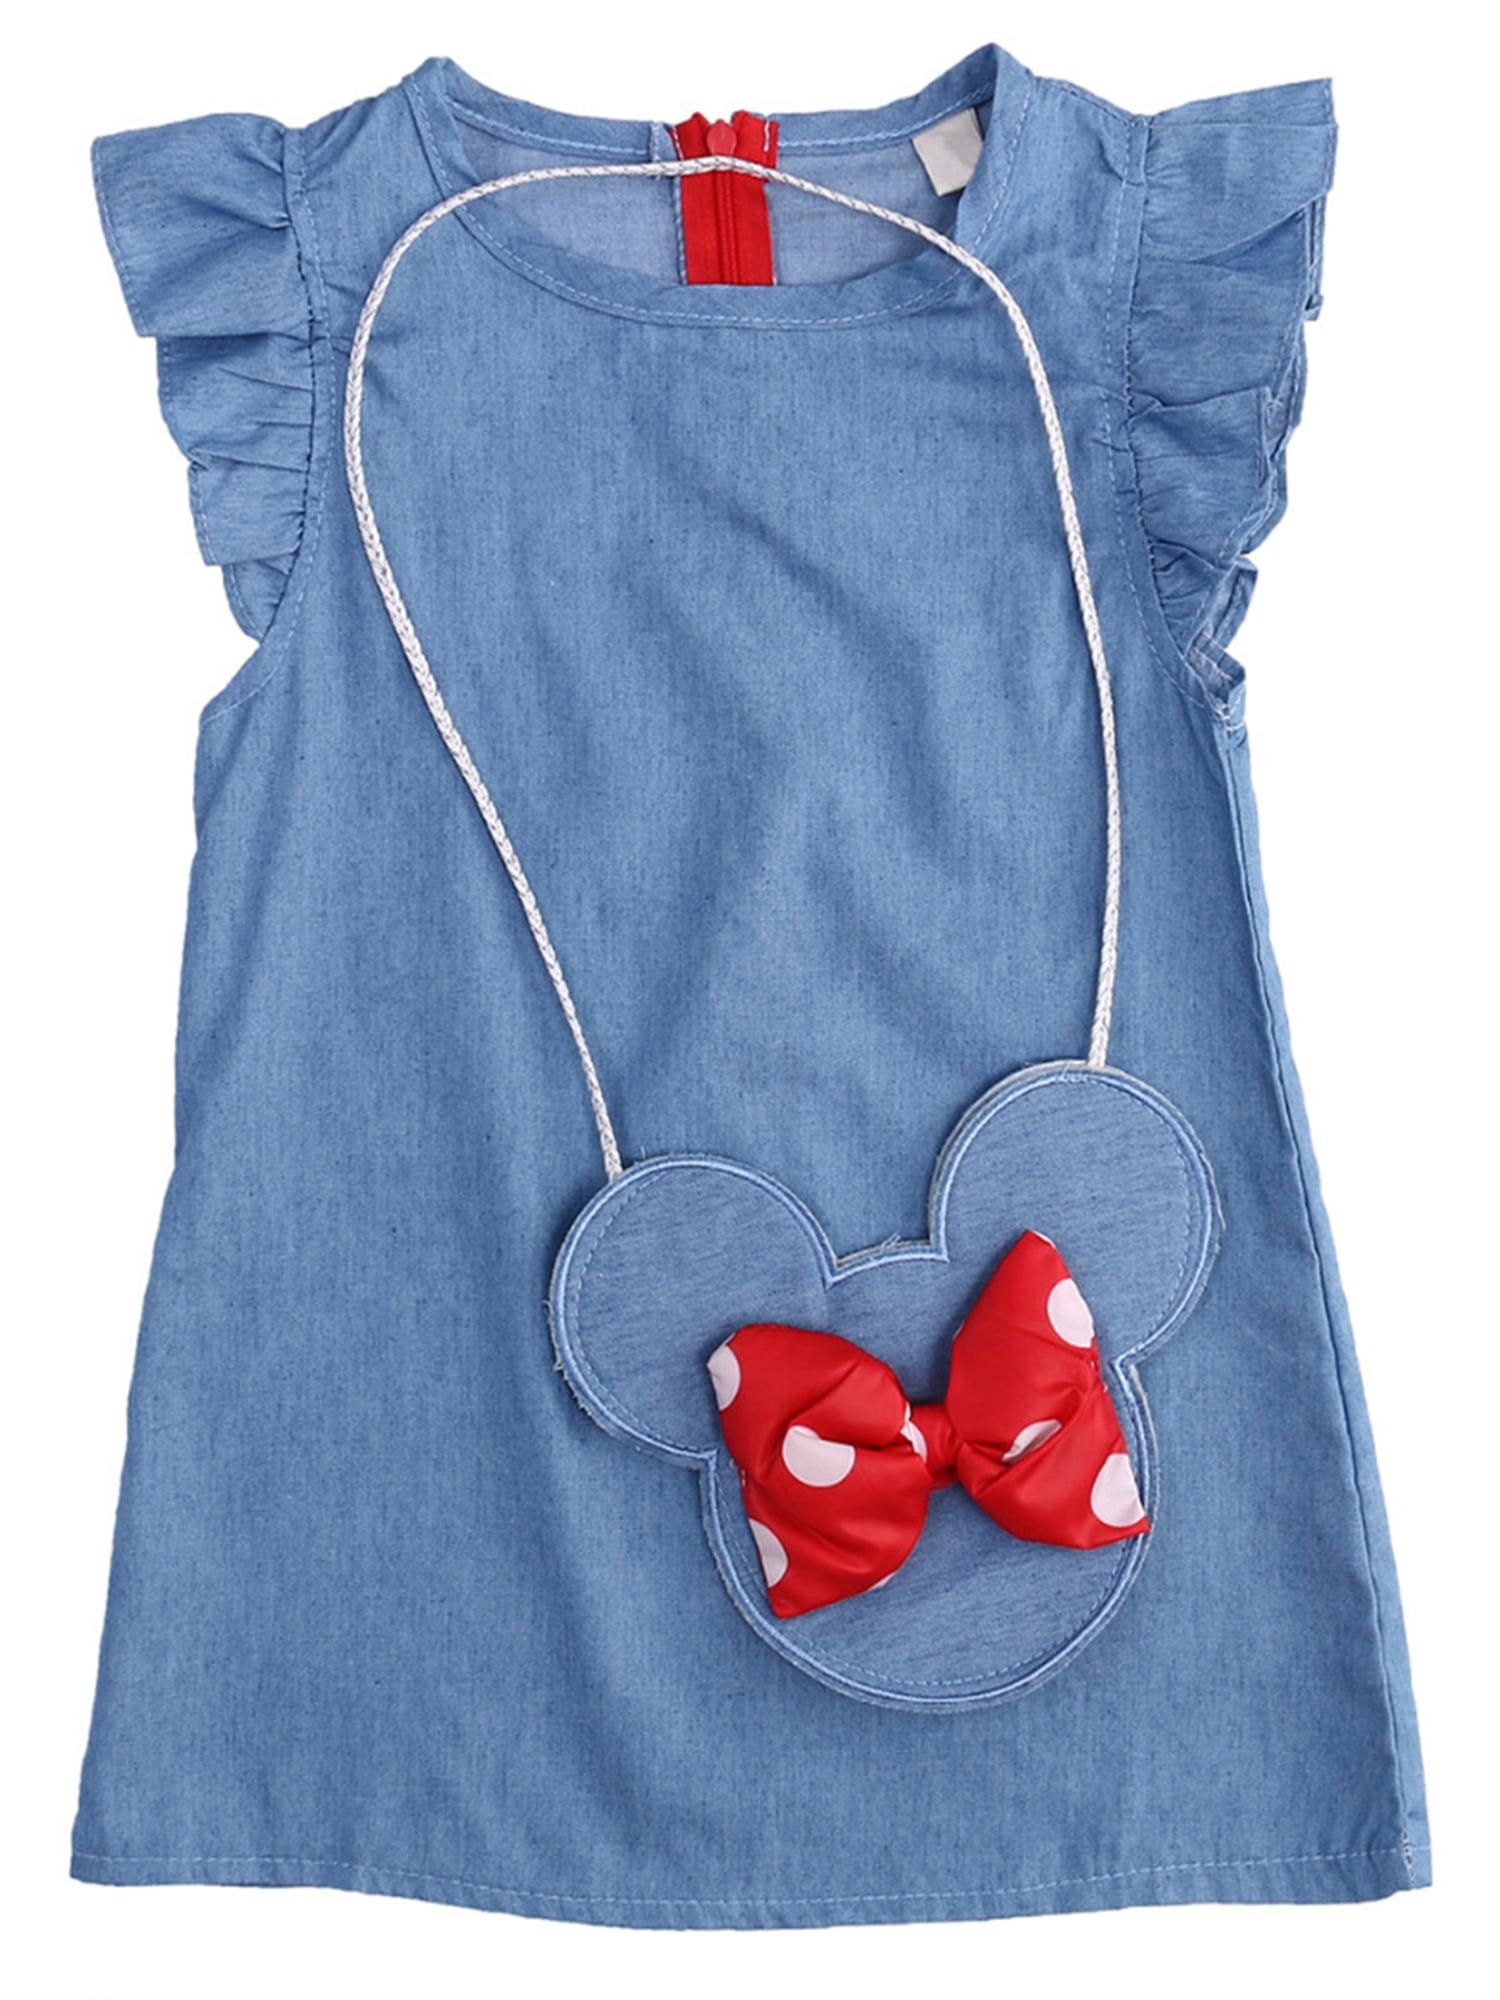 StylesILove Baby Girl Ruffle Sleeve Shabby Denim Dress with Coin Bag 2 pcs Set (90/3T)